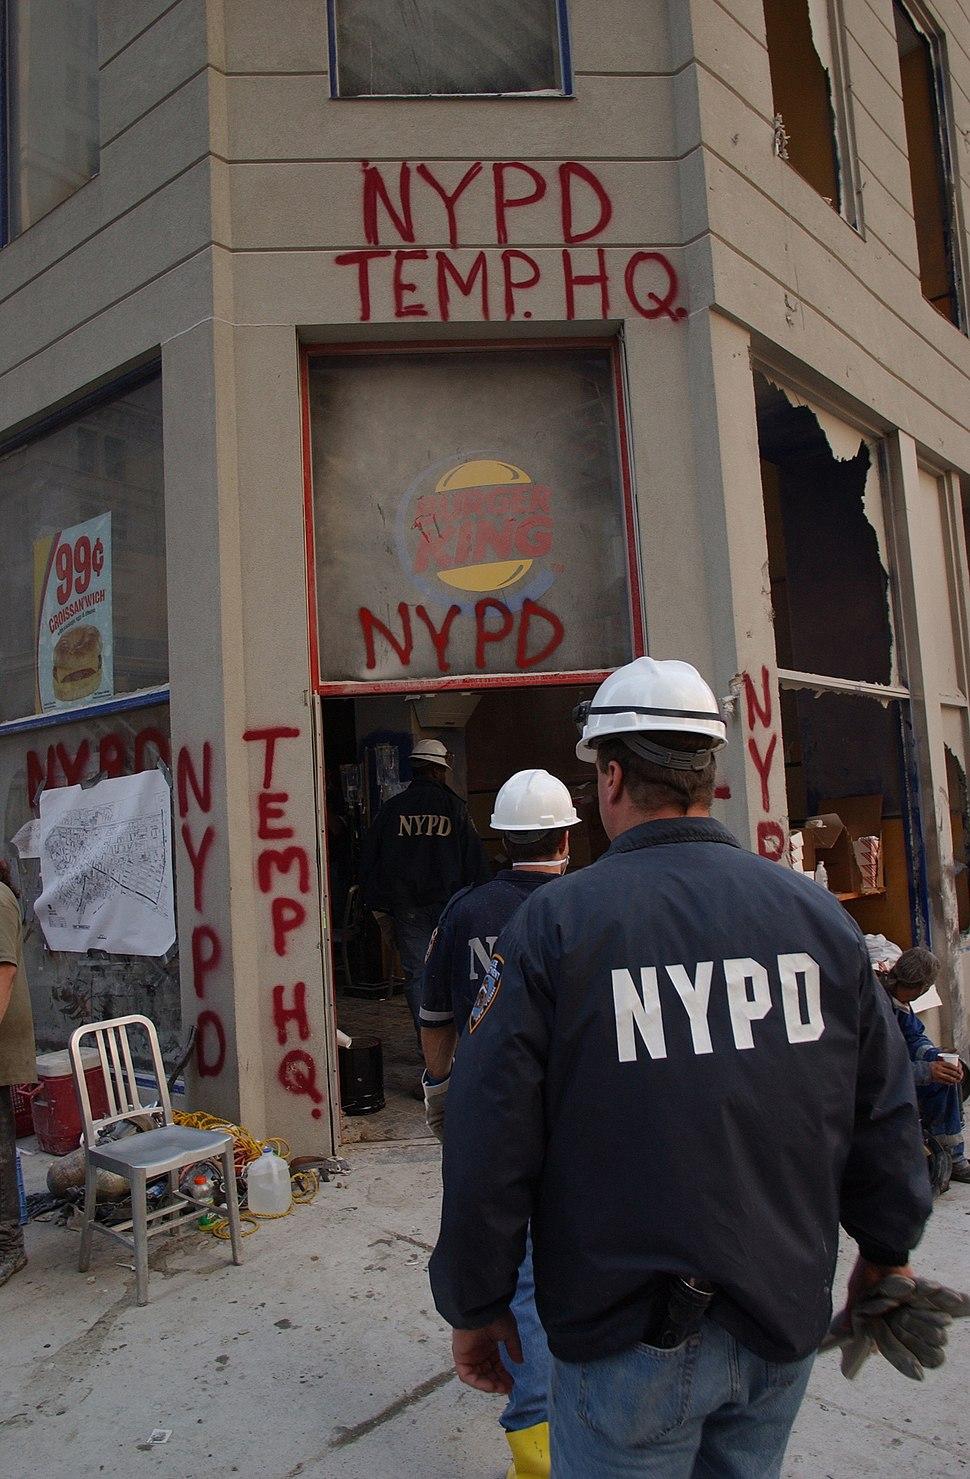 September 11th NYPD TEMP HQ Burger King WTC New York City